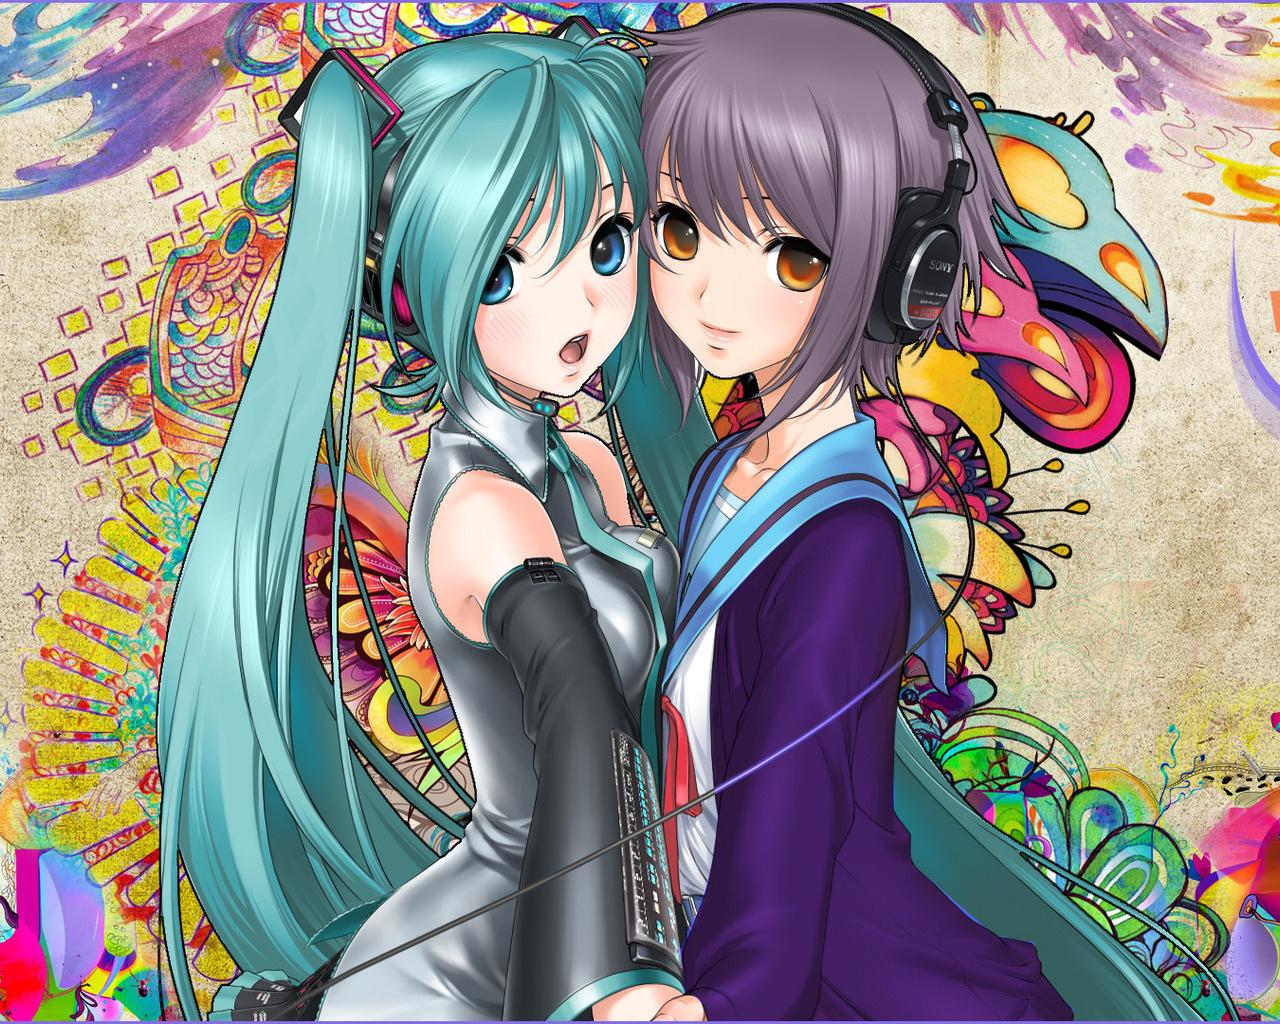 Нажмите на картинку, чтобы увеличить ...: www.kartinki24.ru/kartinki/anime/9611.html